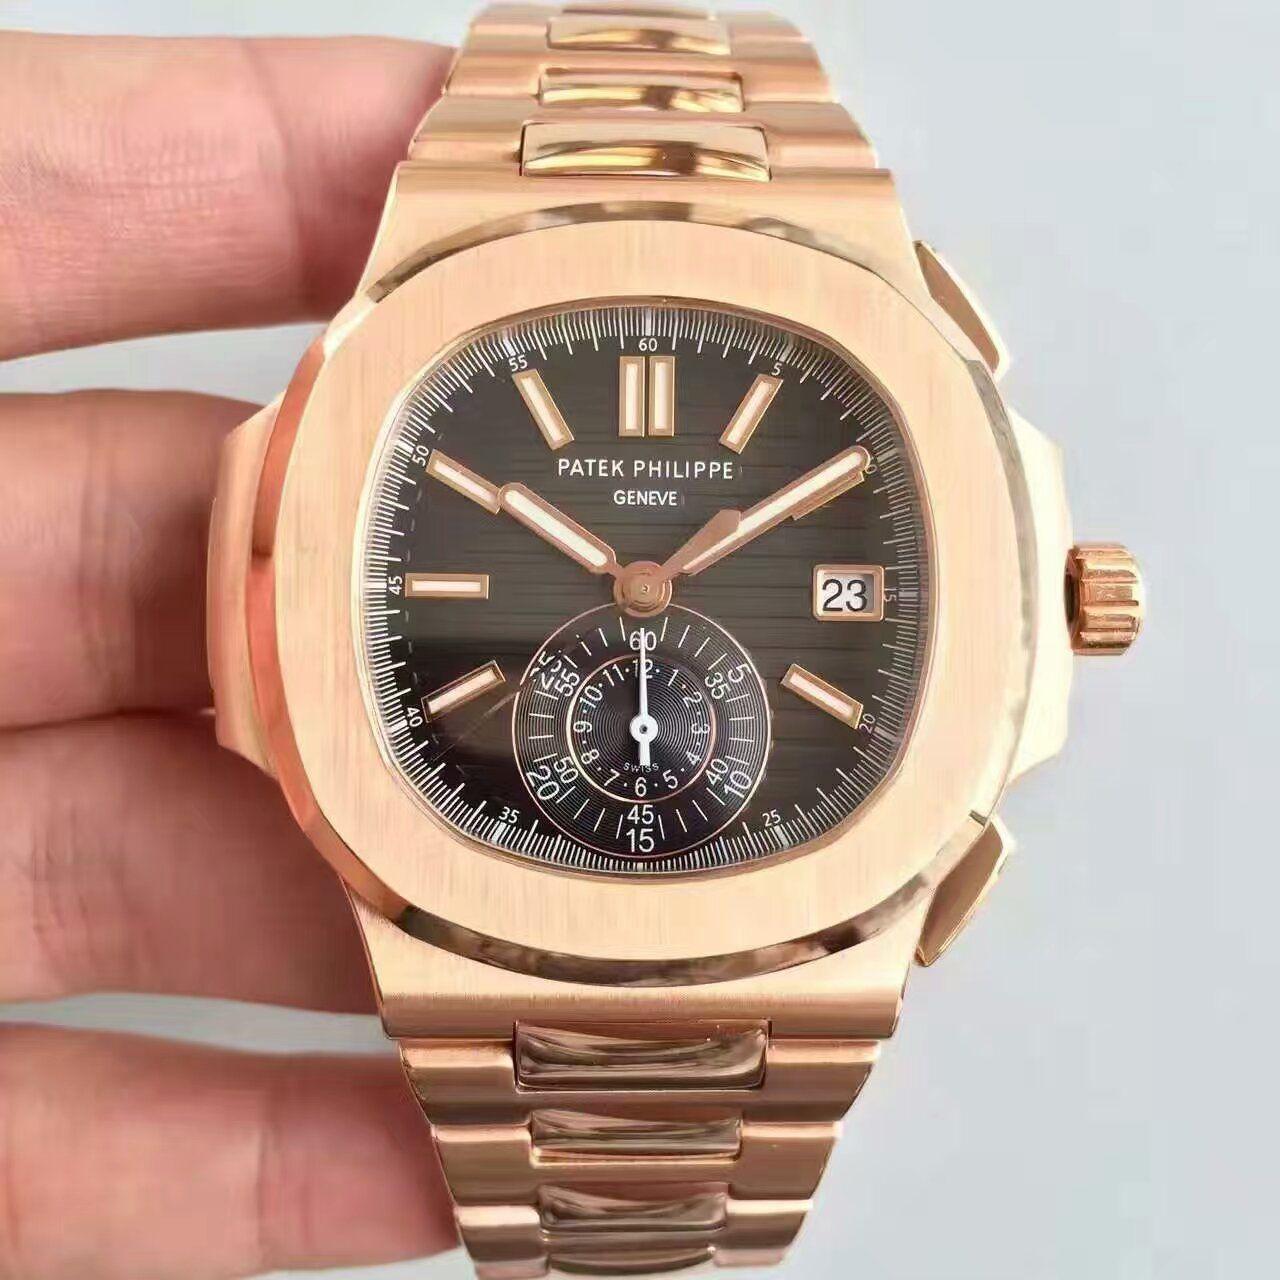 【BP厂1:1高仿手表】百达翡丽运动系列5980/1R-001腕表价格报价